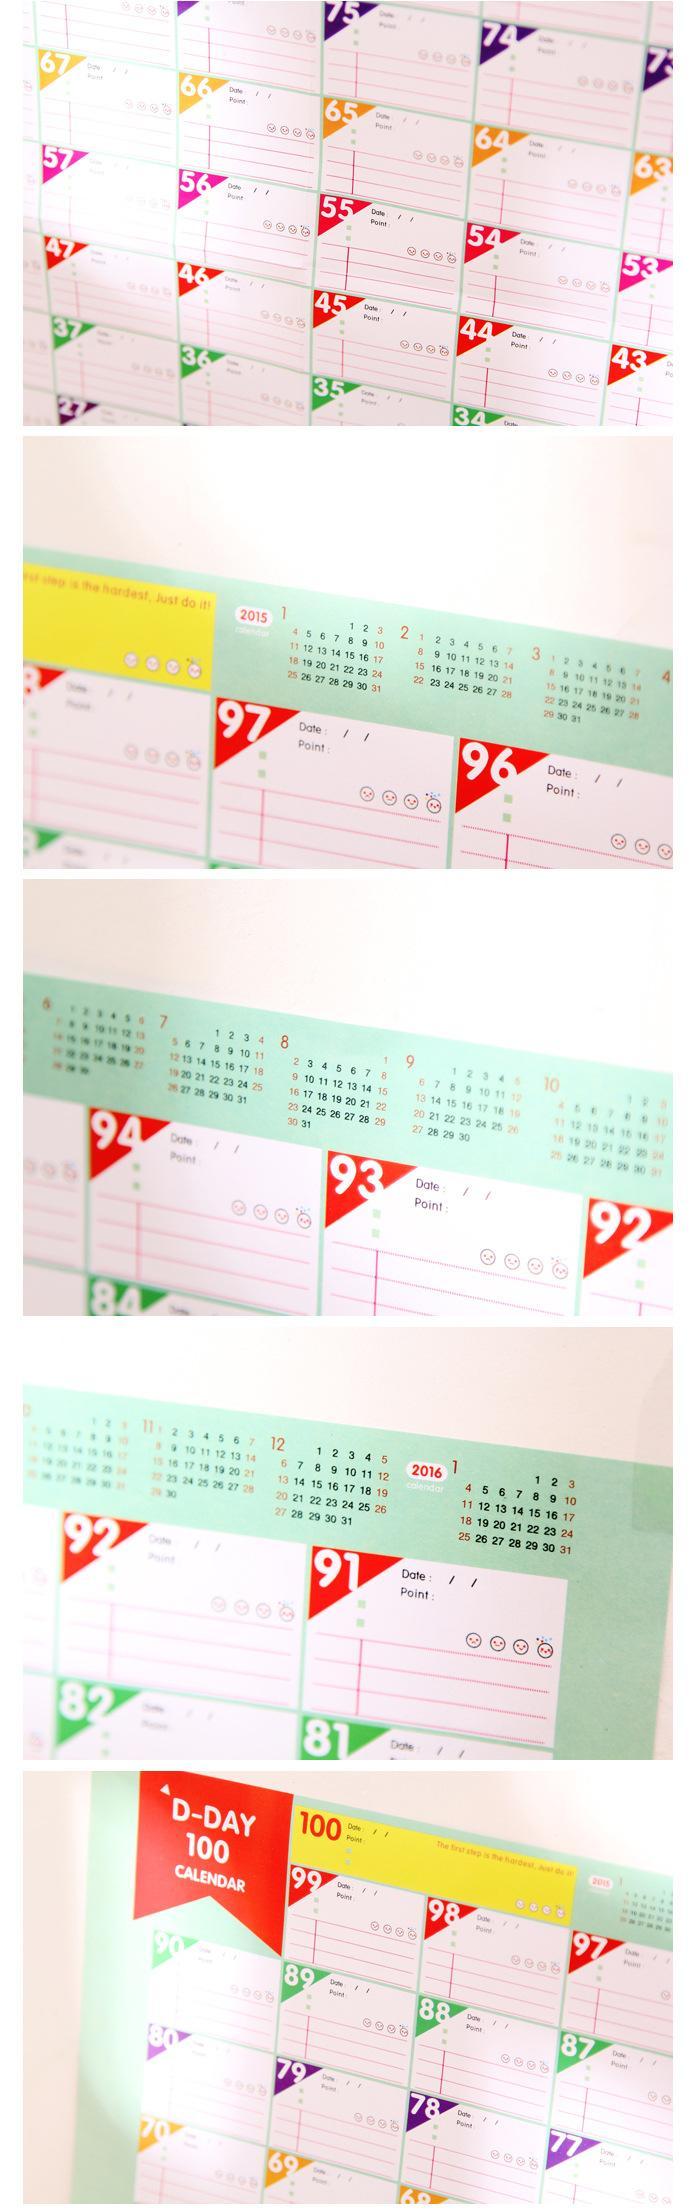 Calendar Planner Target : 30pcs wall calendar planner learning study 100 day countdown 2015